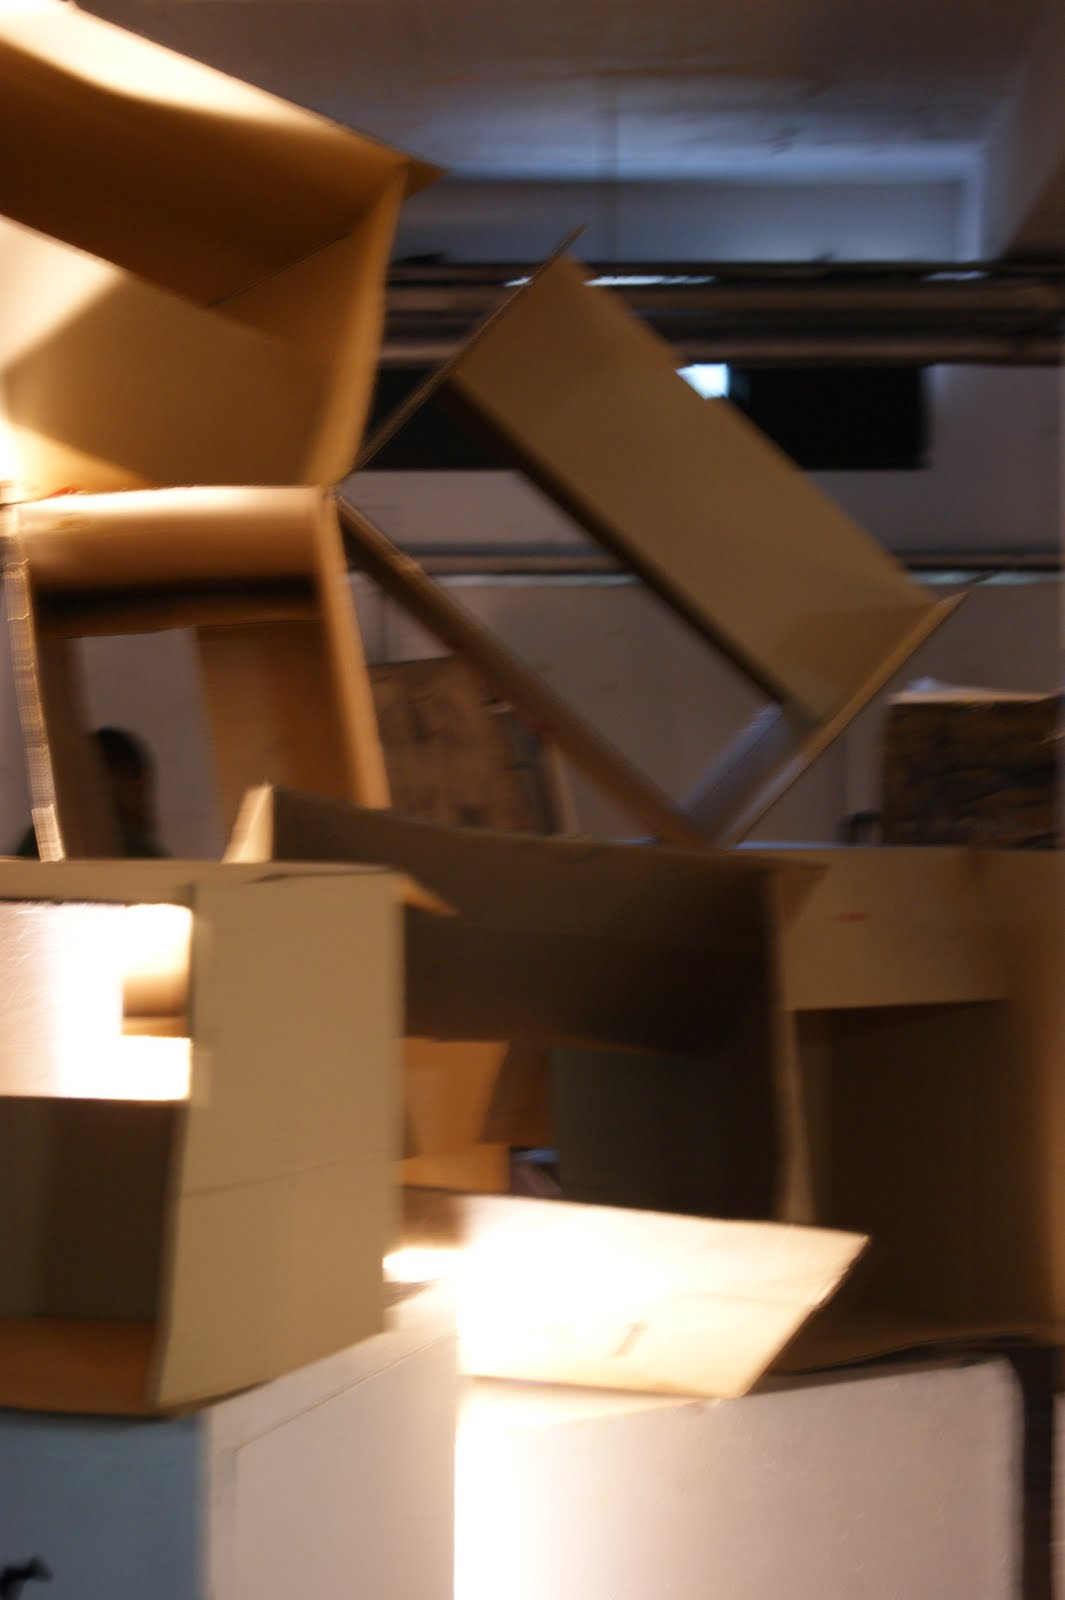 DAI 1 SHUFFLING: encuadre medio cajas